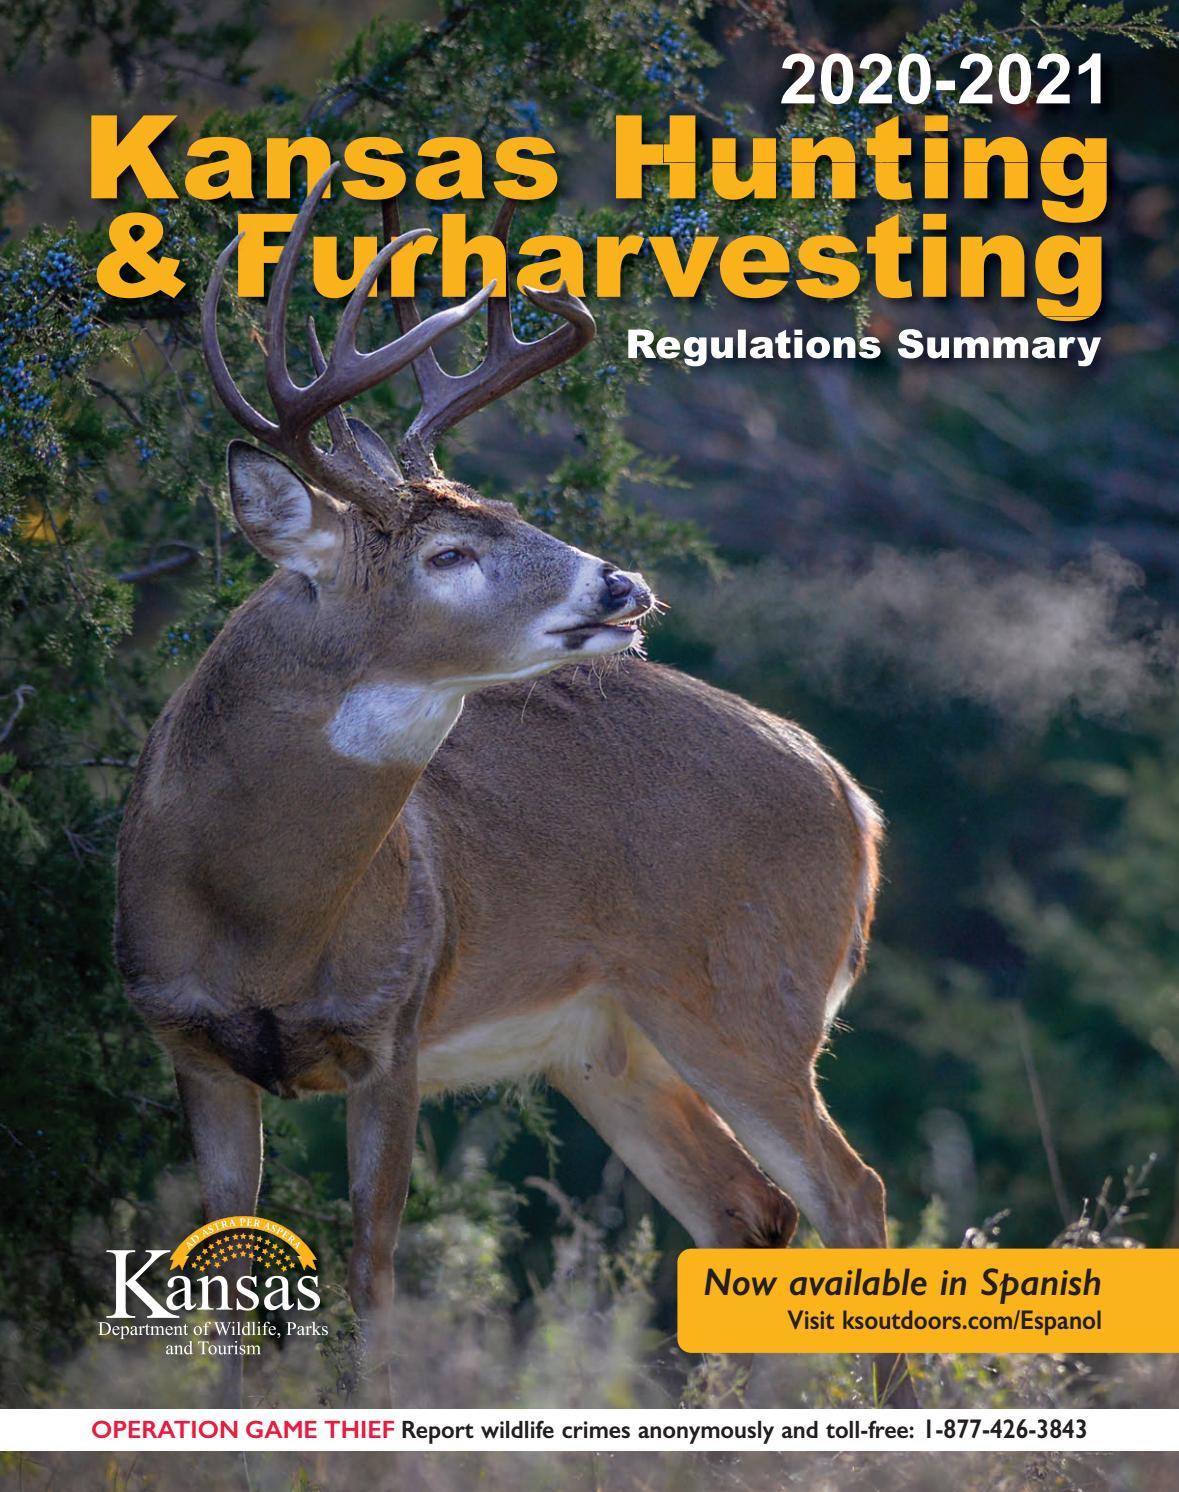 2020-2021 Kansas Hunting & Furharvesting Regulations Summary with 2021 Deer Rut Prediction